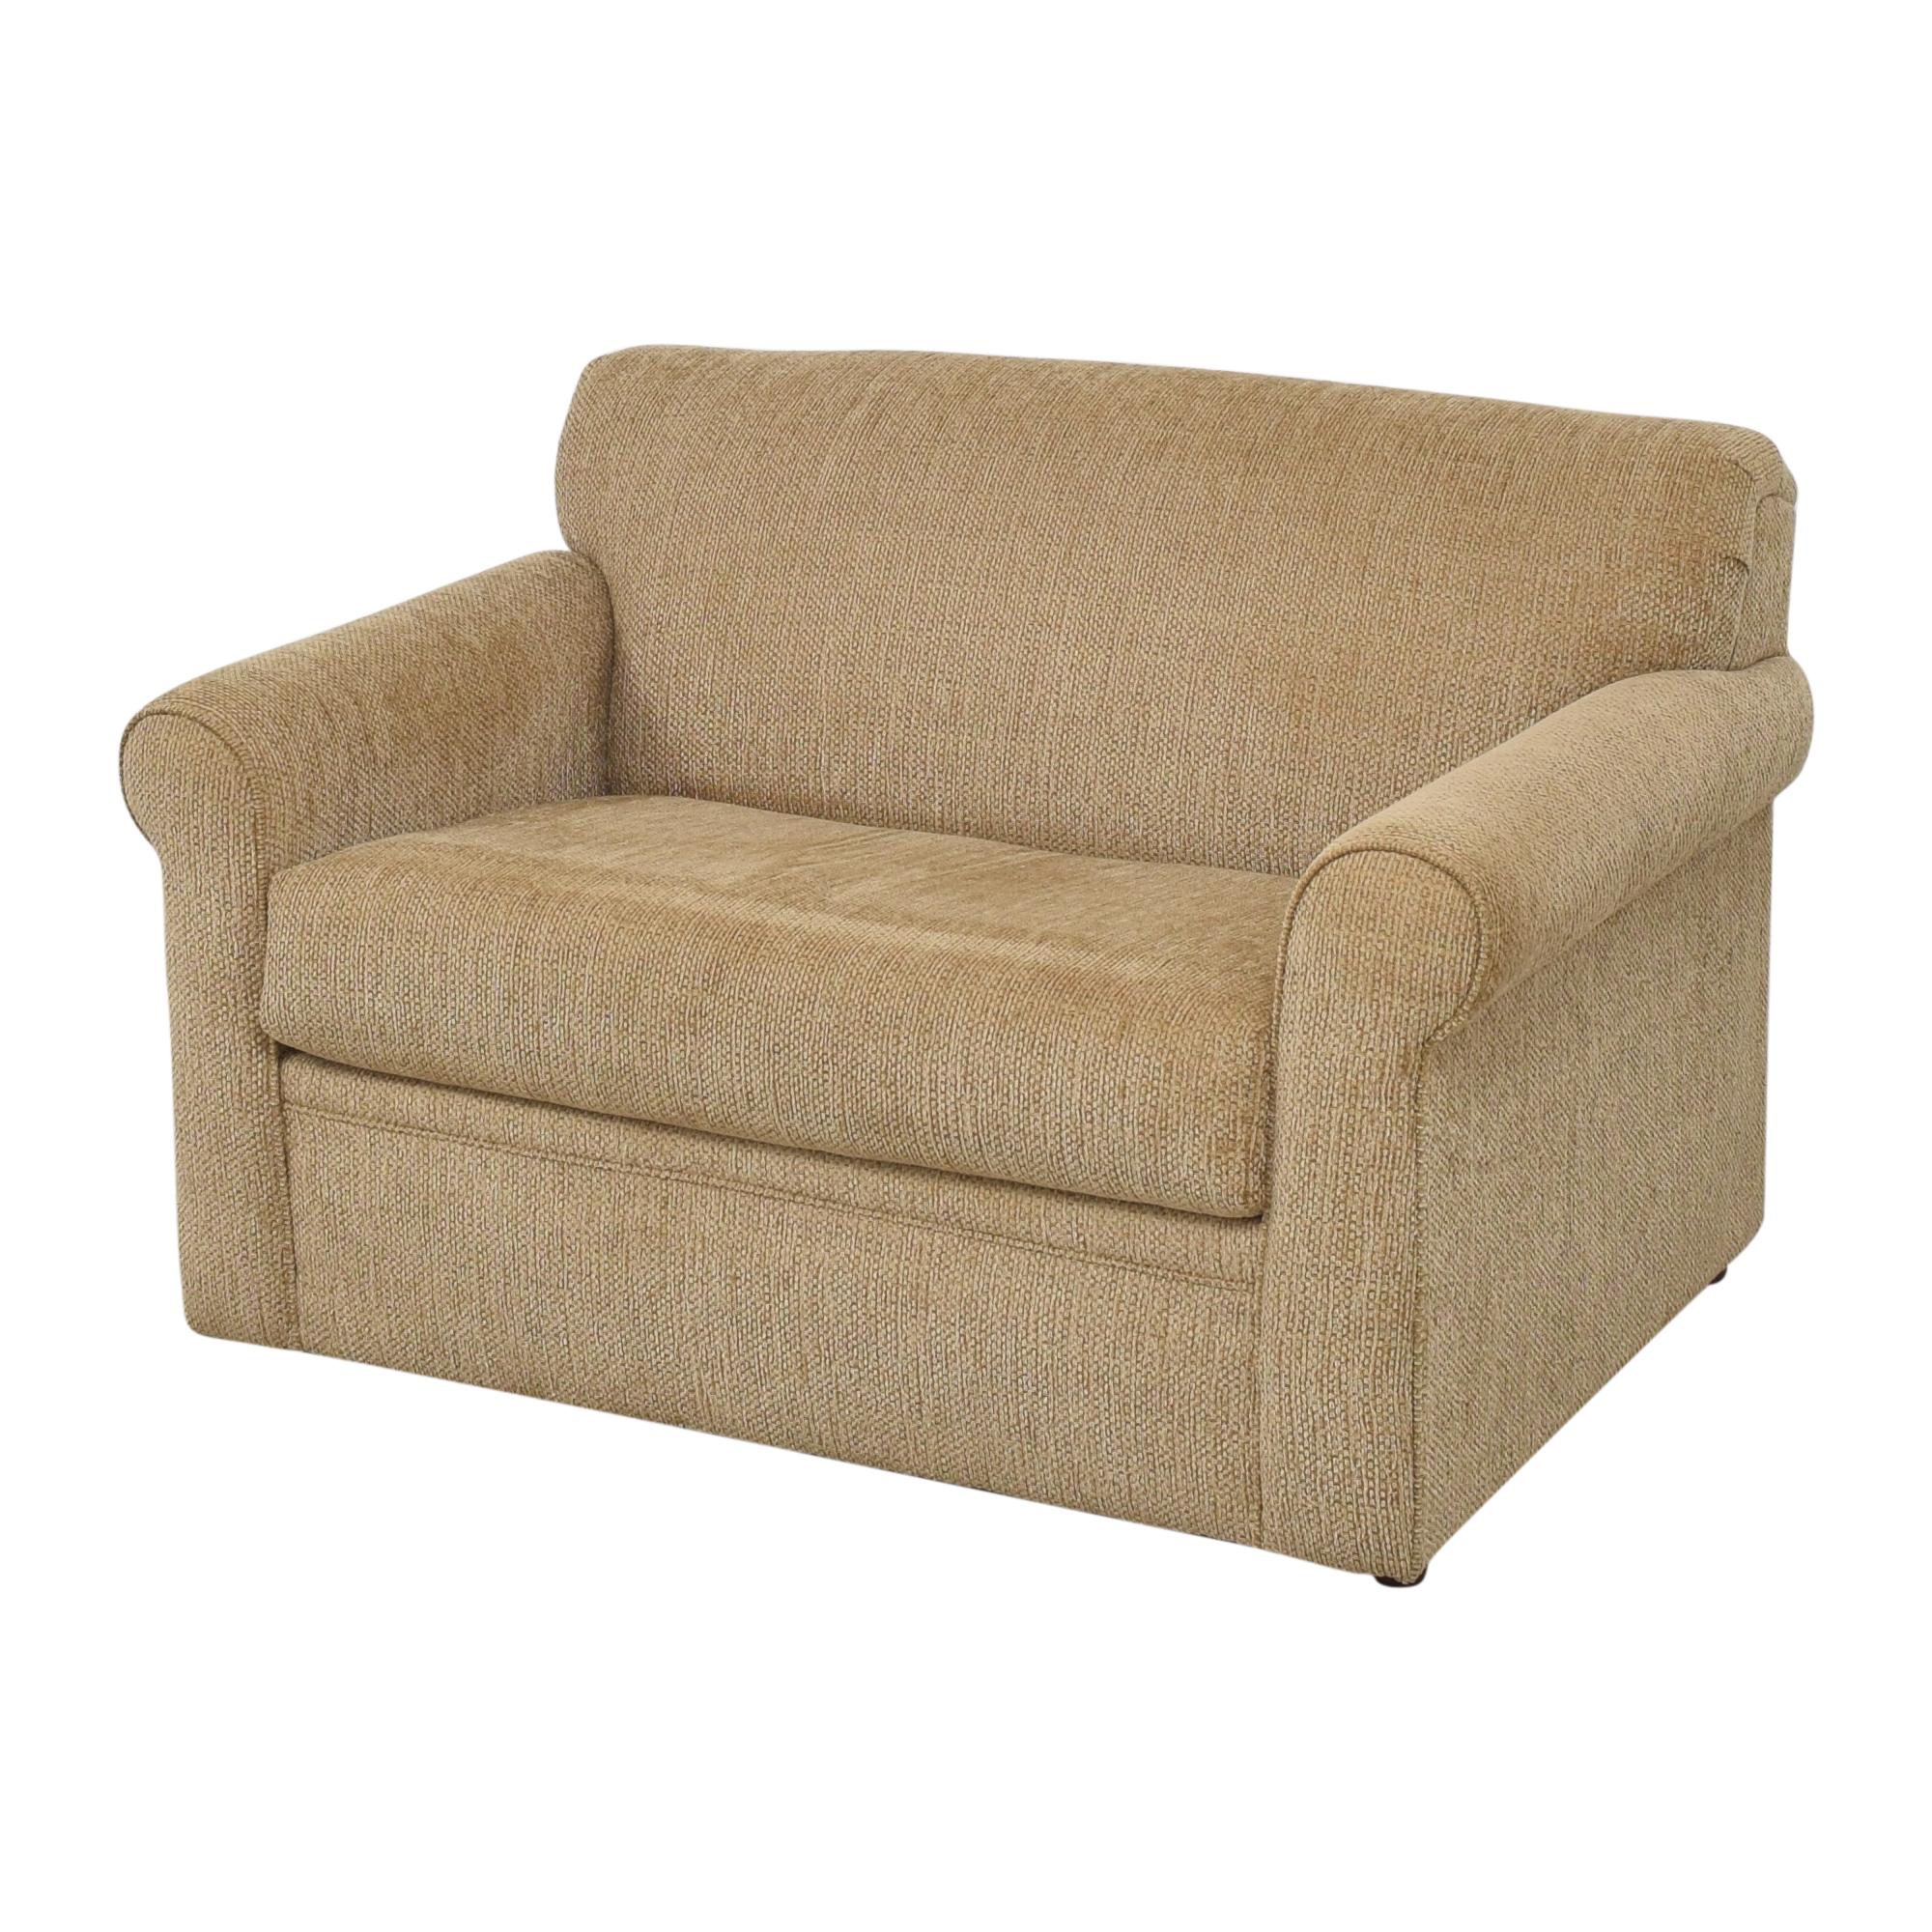 buy Overnight Sofa Overnight Sofa Sleeper Chair online